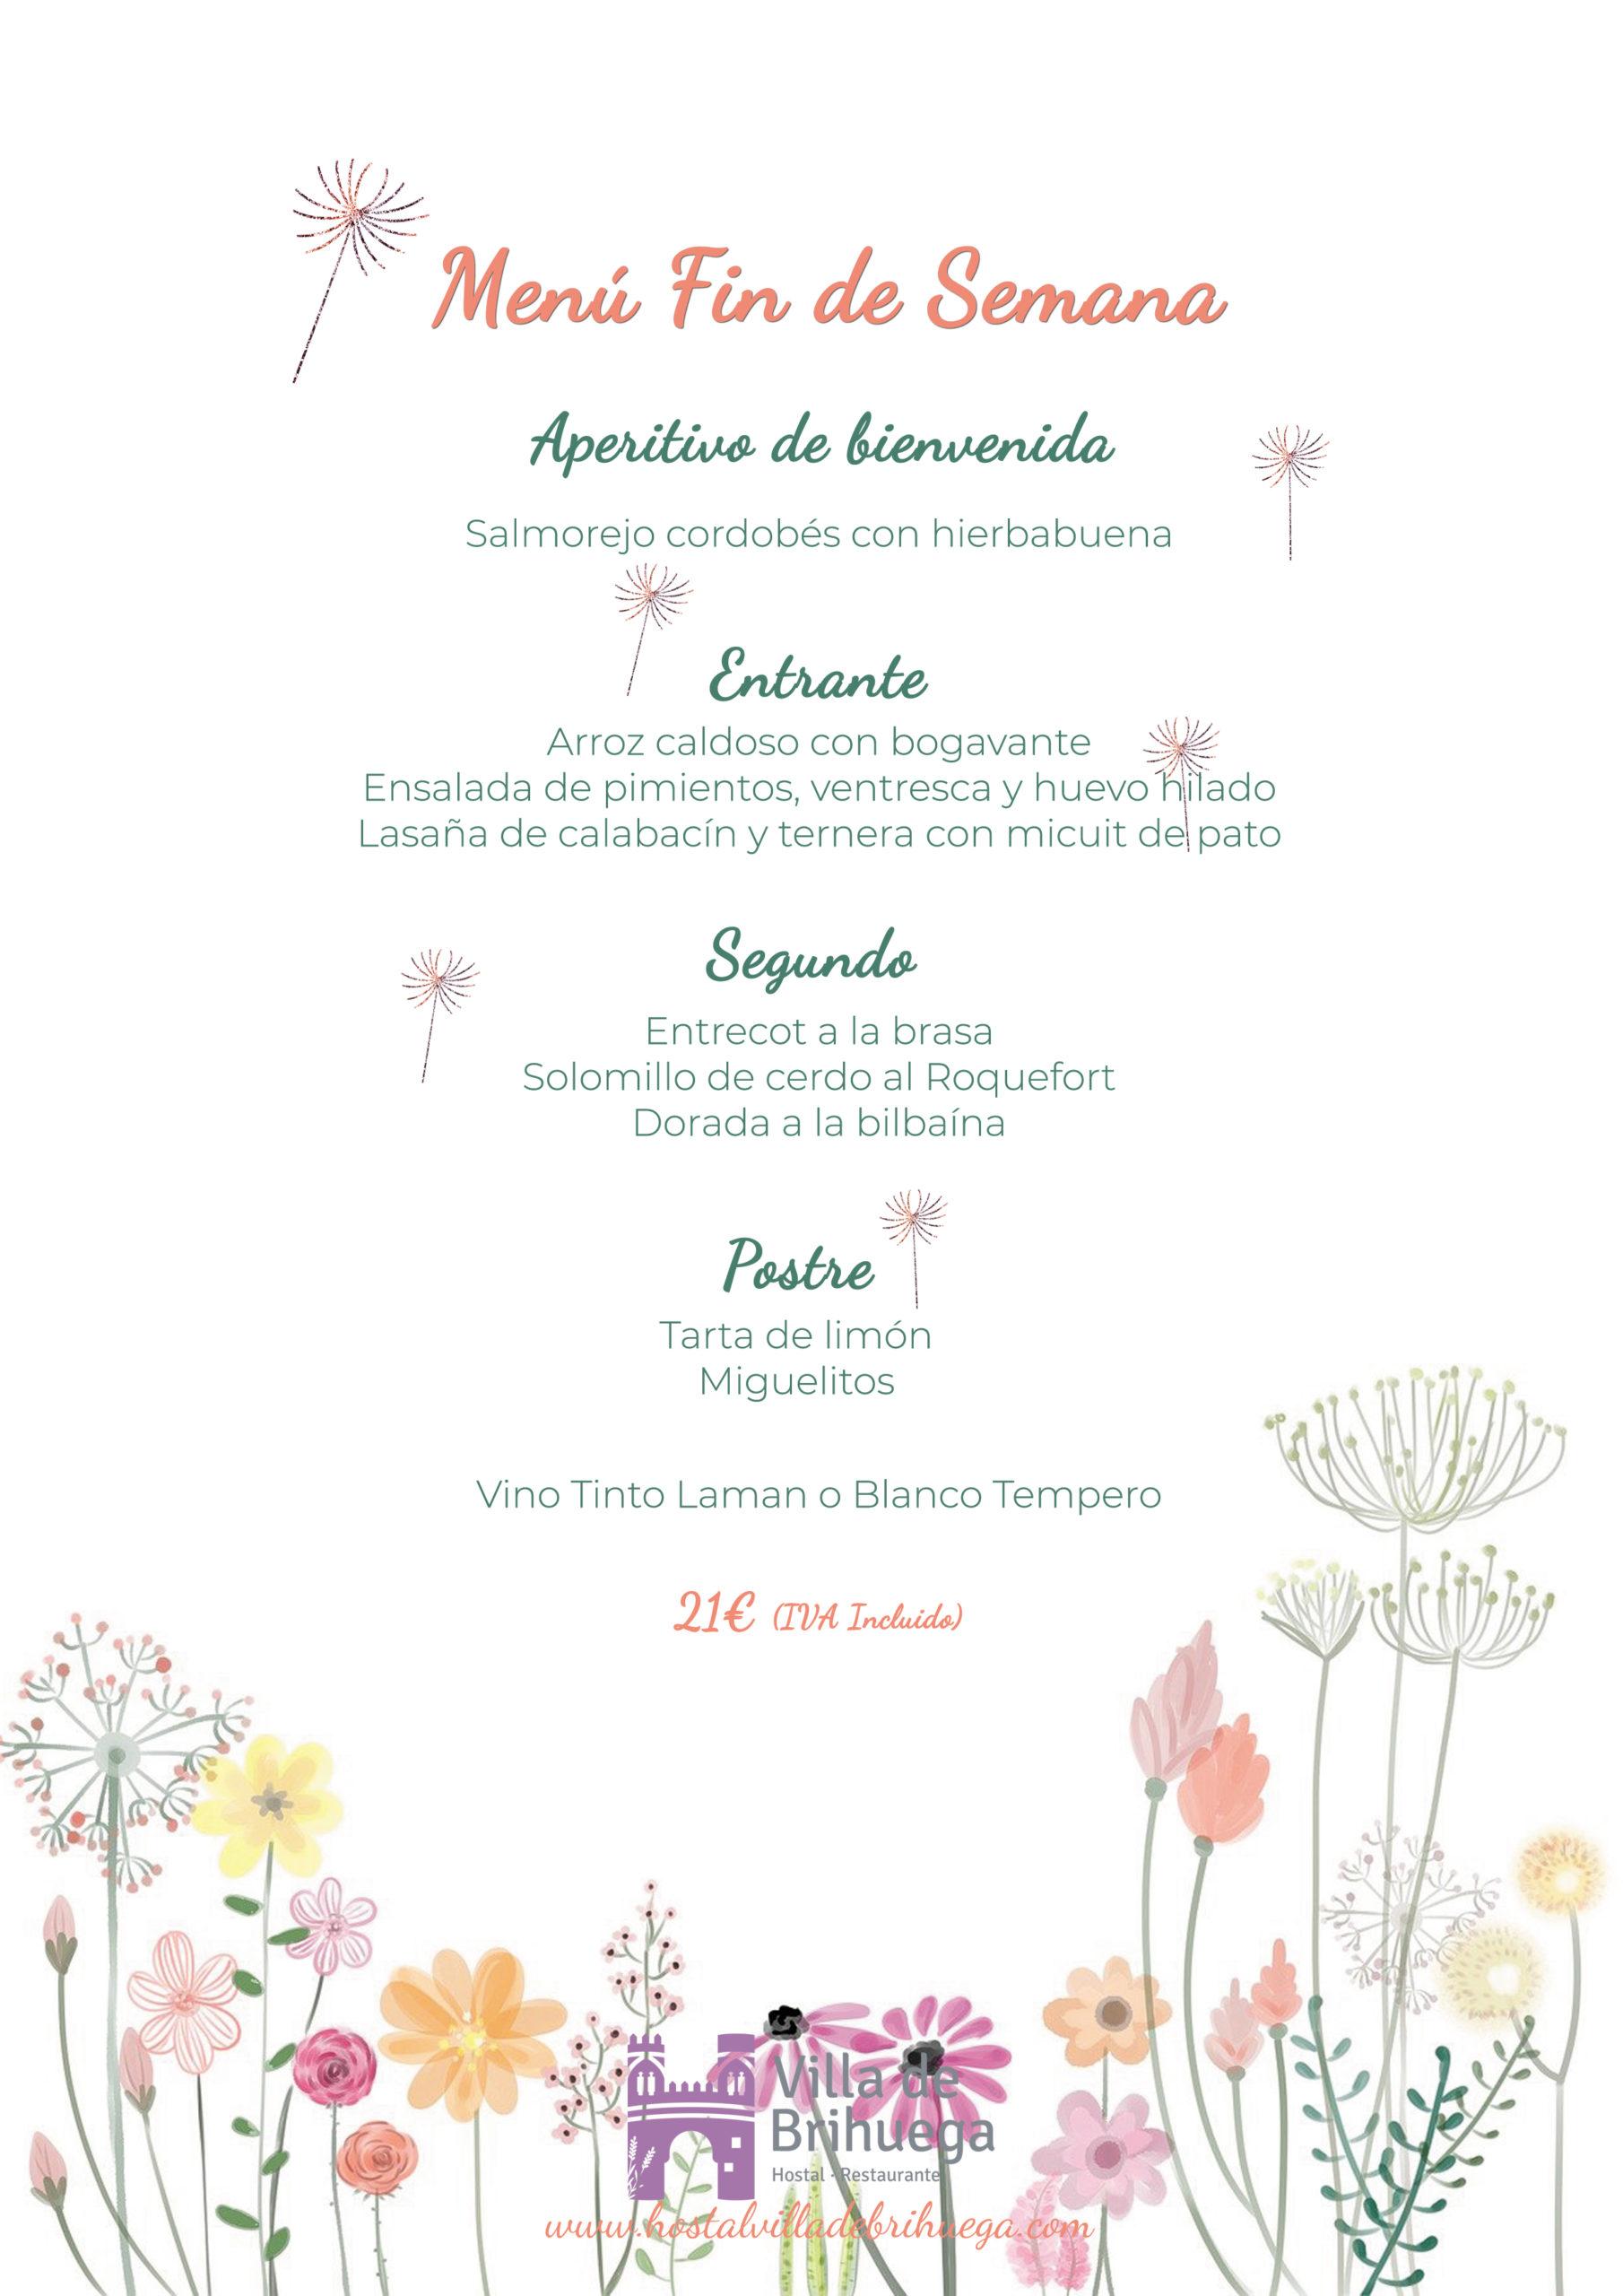 Menú fin de semana Restaurante Villa de Brihuega.